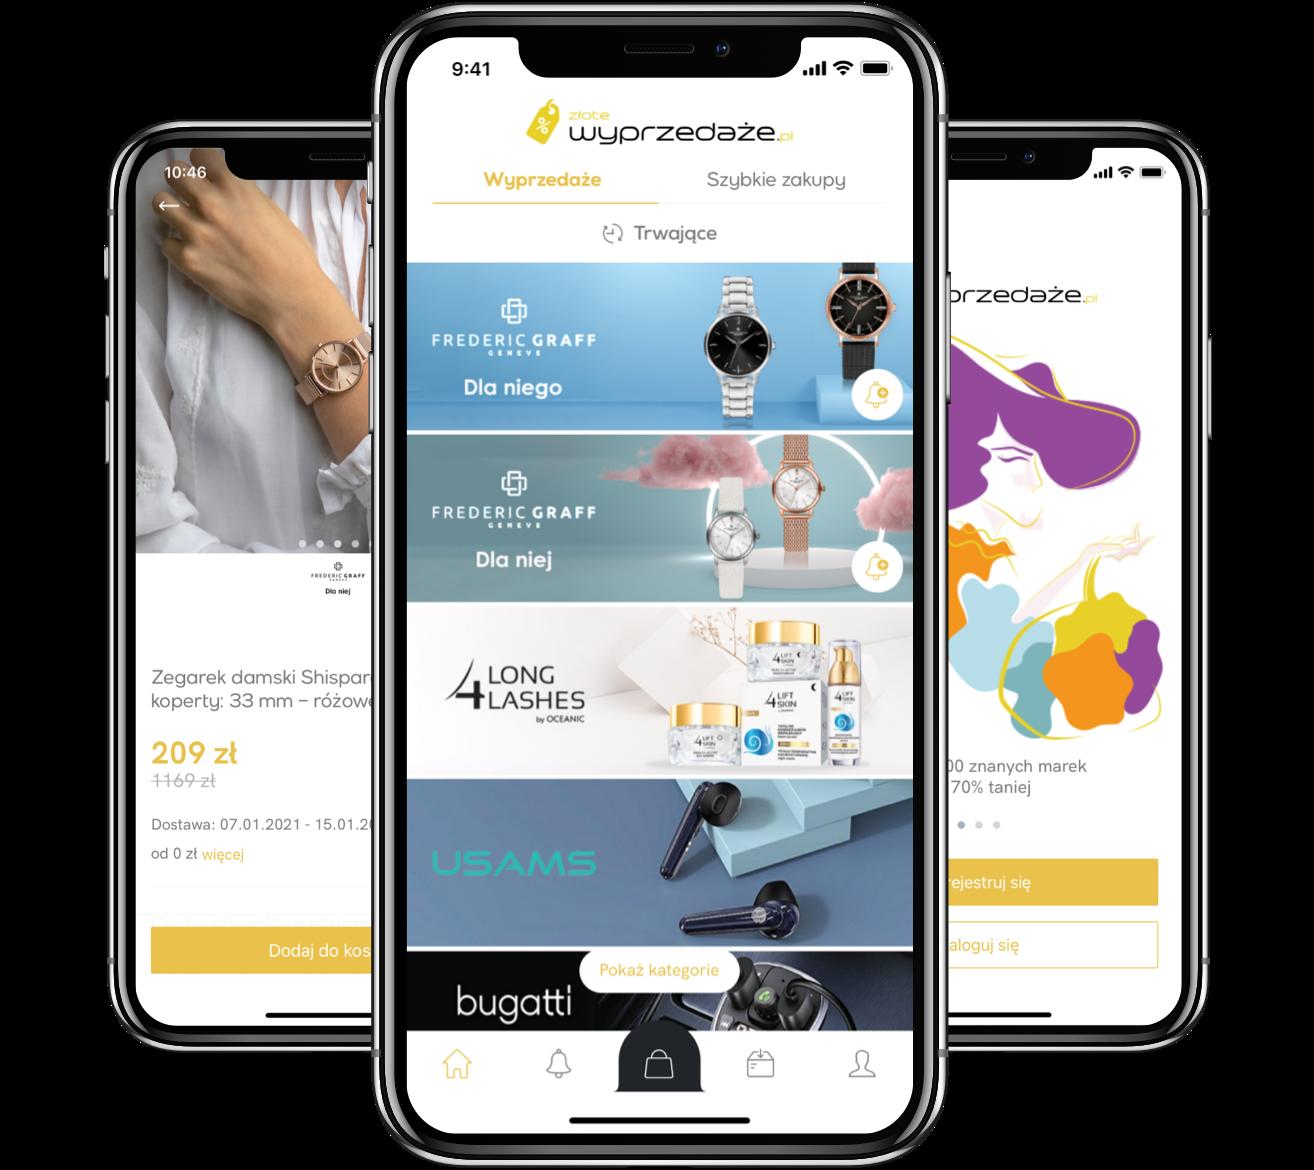 Zlote Wyprzedaze mCommerce Mobile App Design